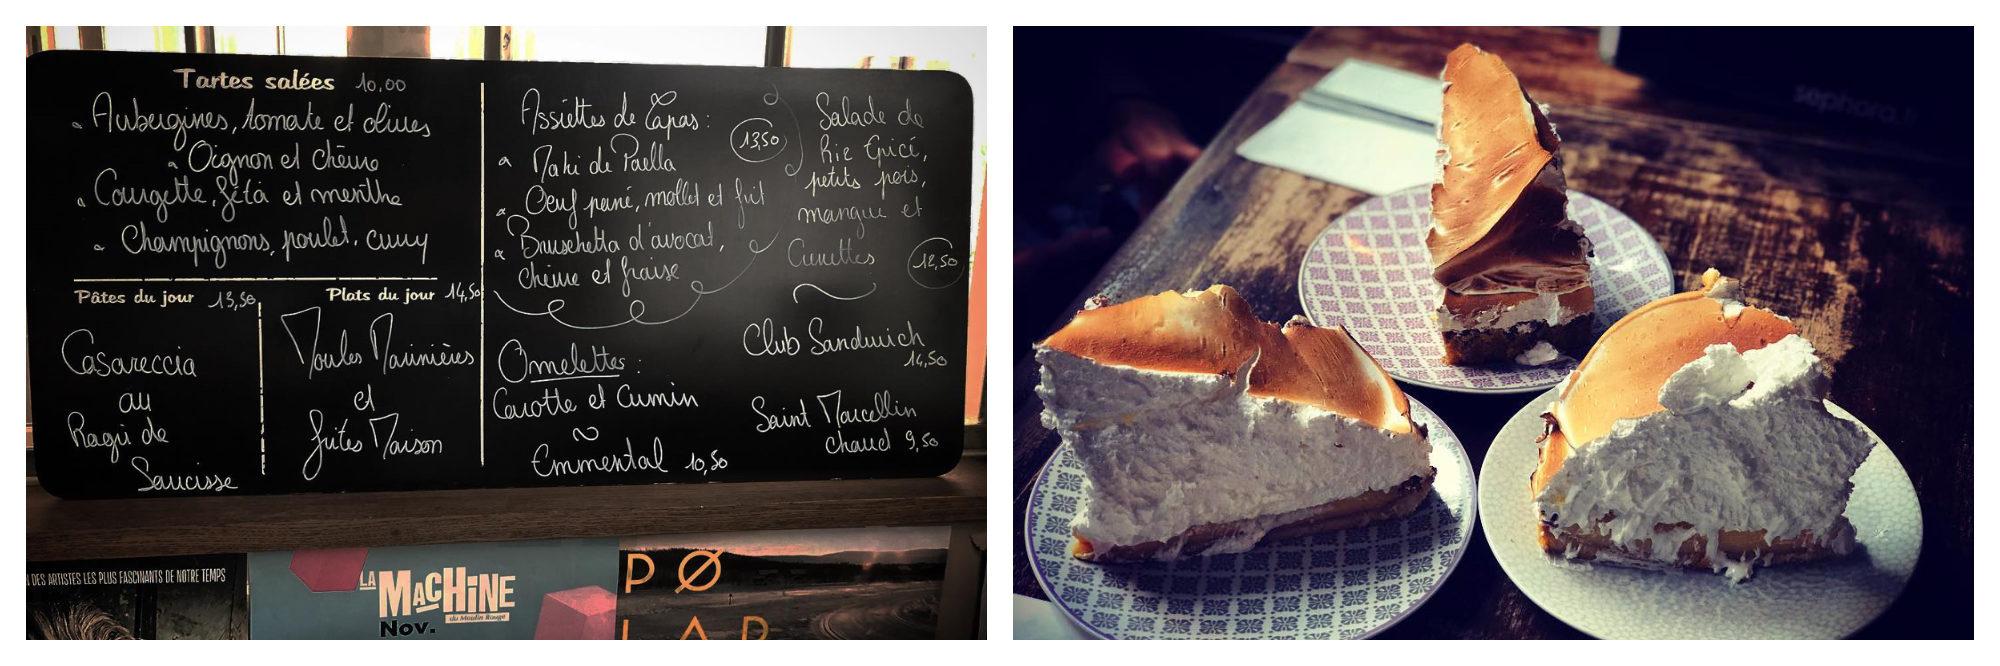 The menu on the chalkboard at Le Loir dans la Théière (left) and an assortment of cakes (right).